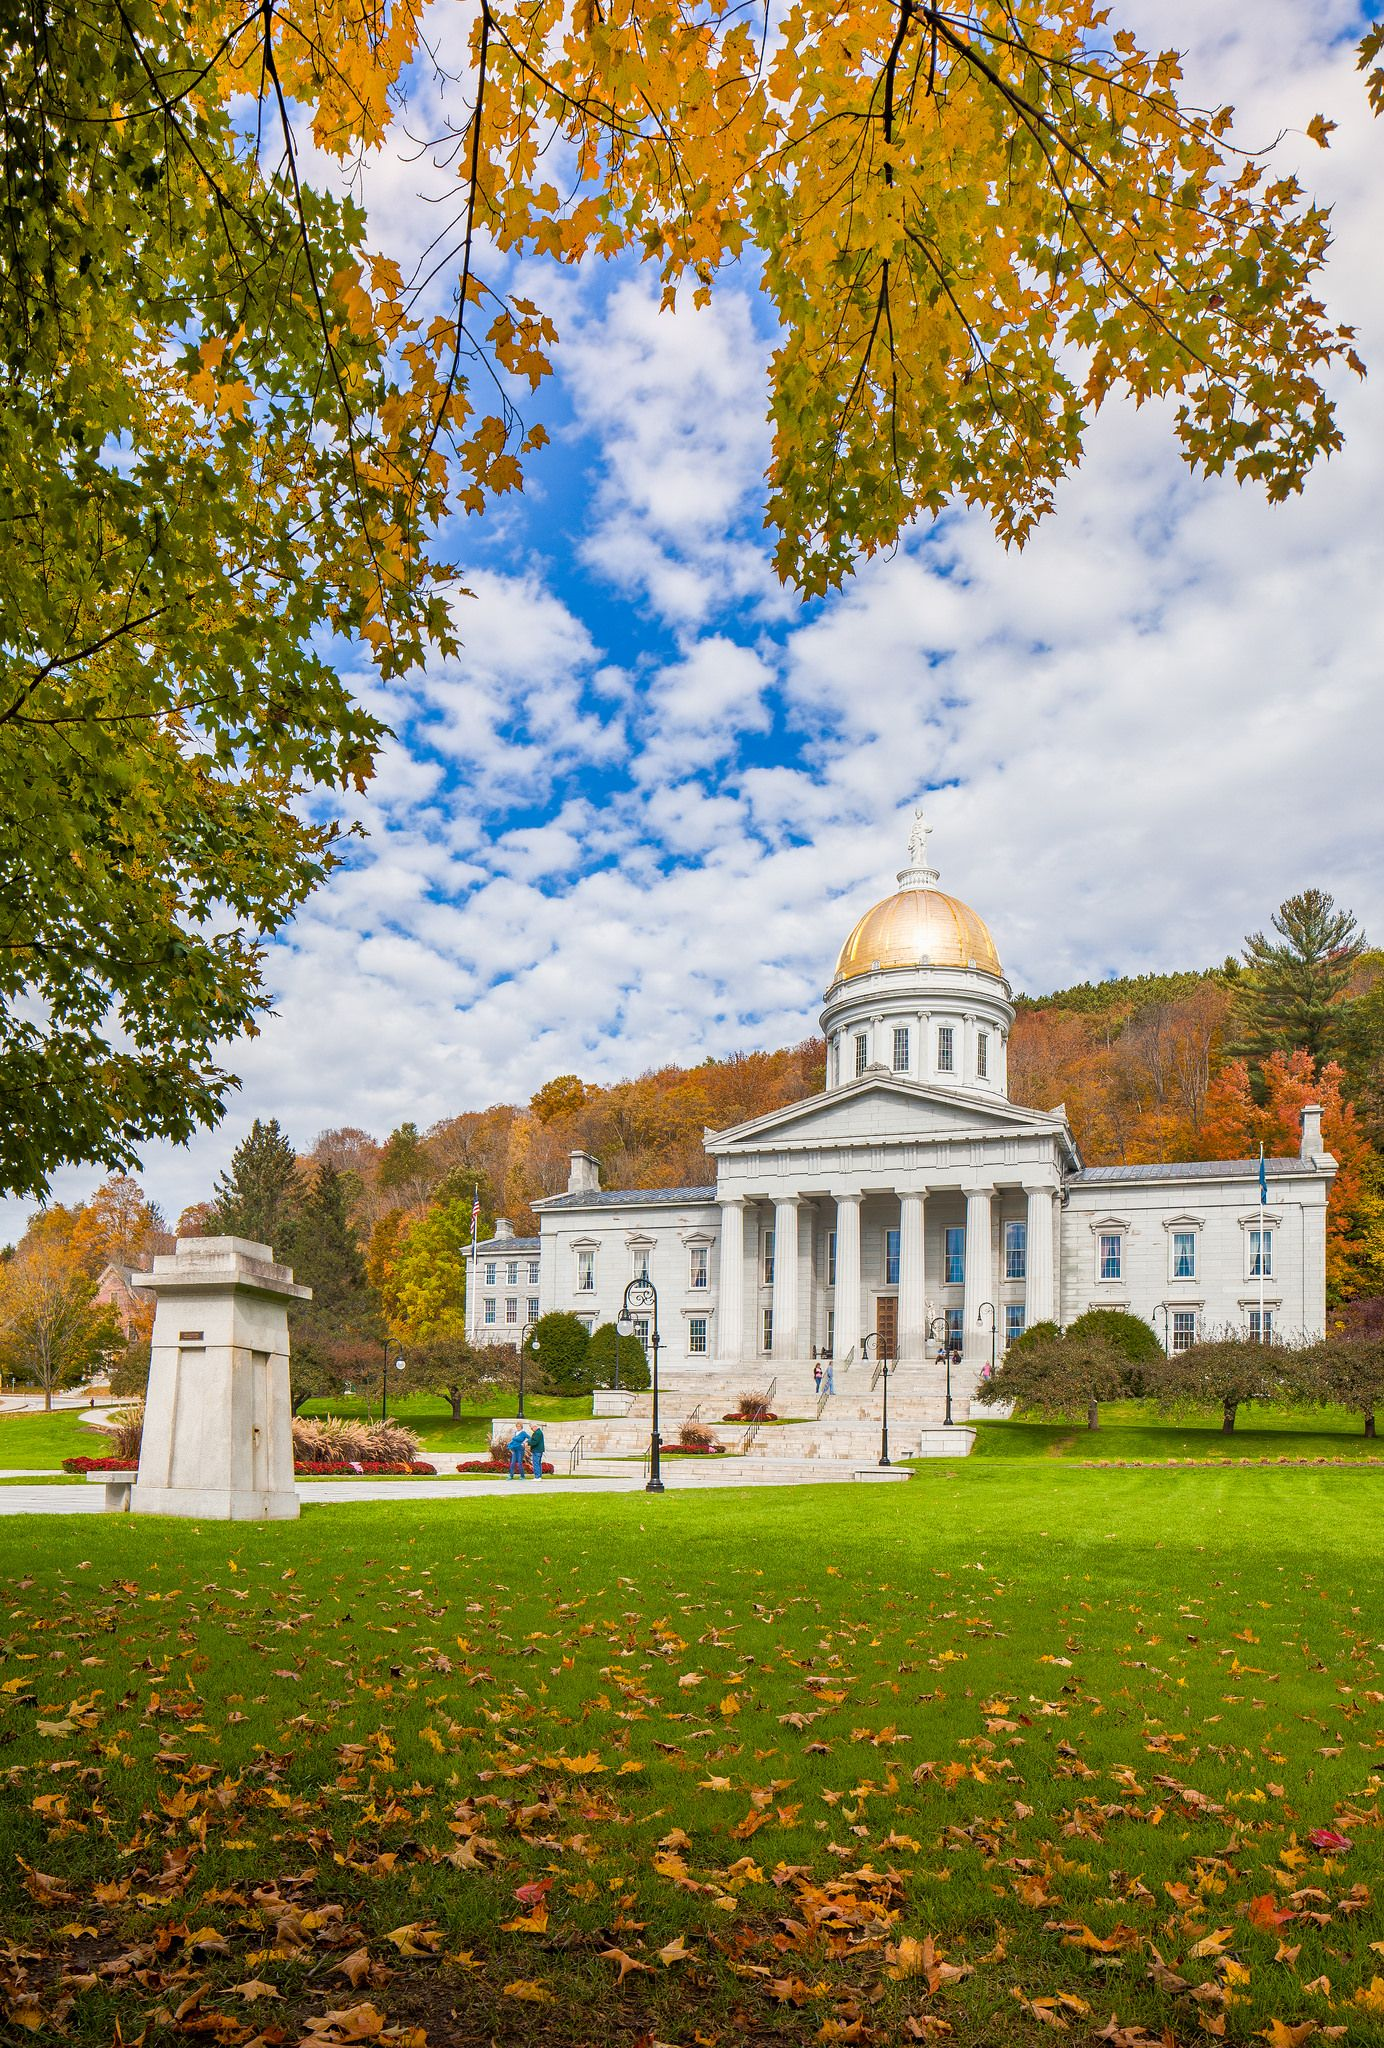 Imágenes: vermont usa | Montpelier, Vermont, Estados